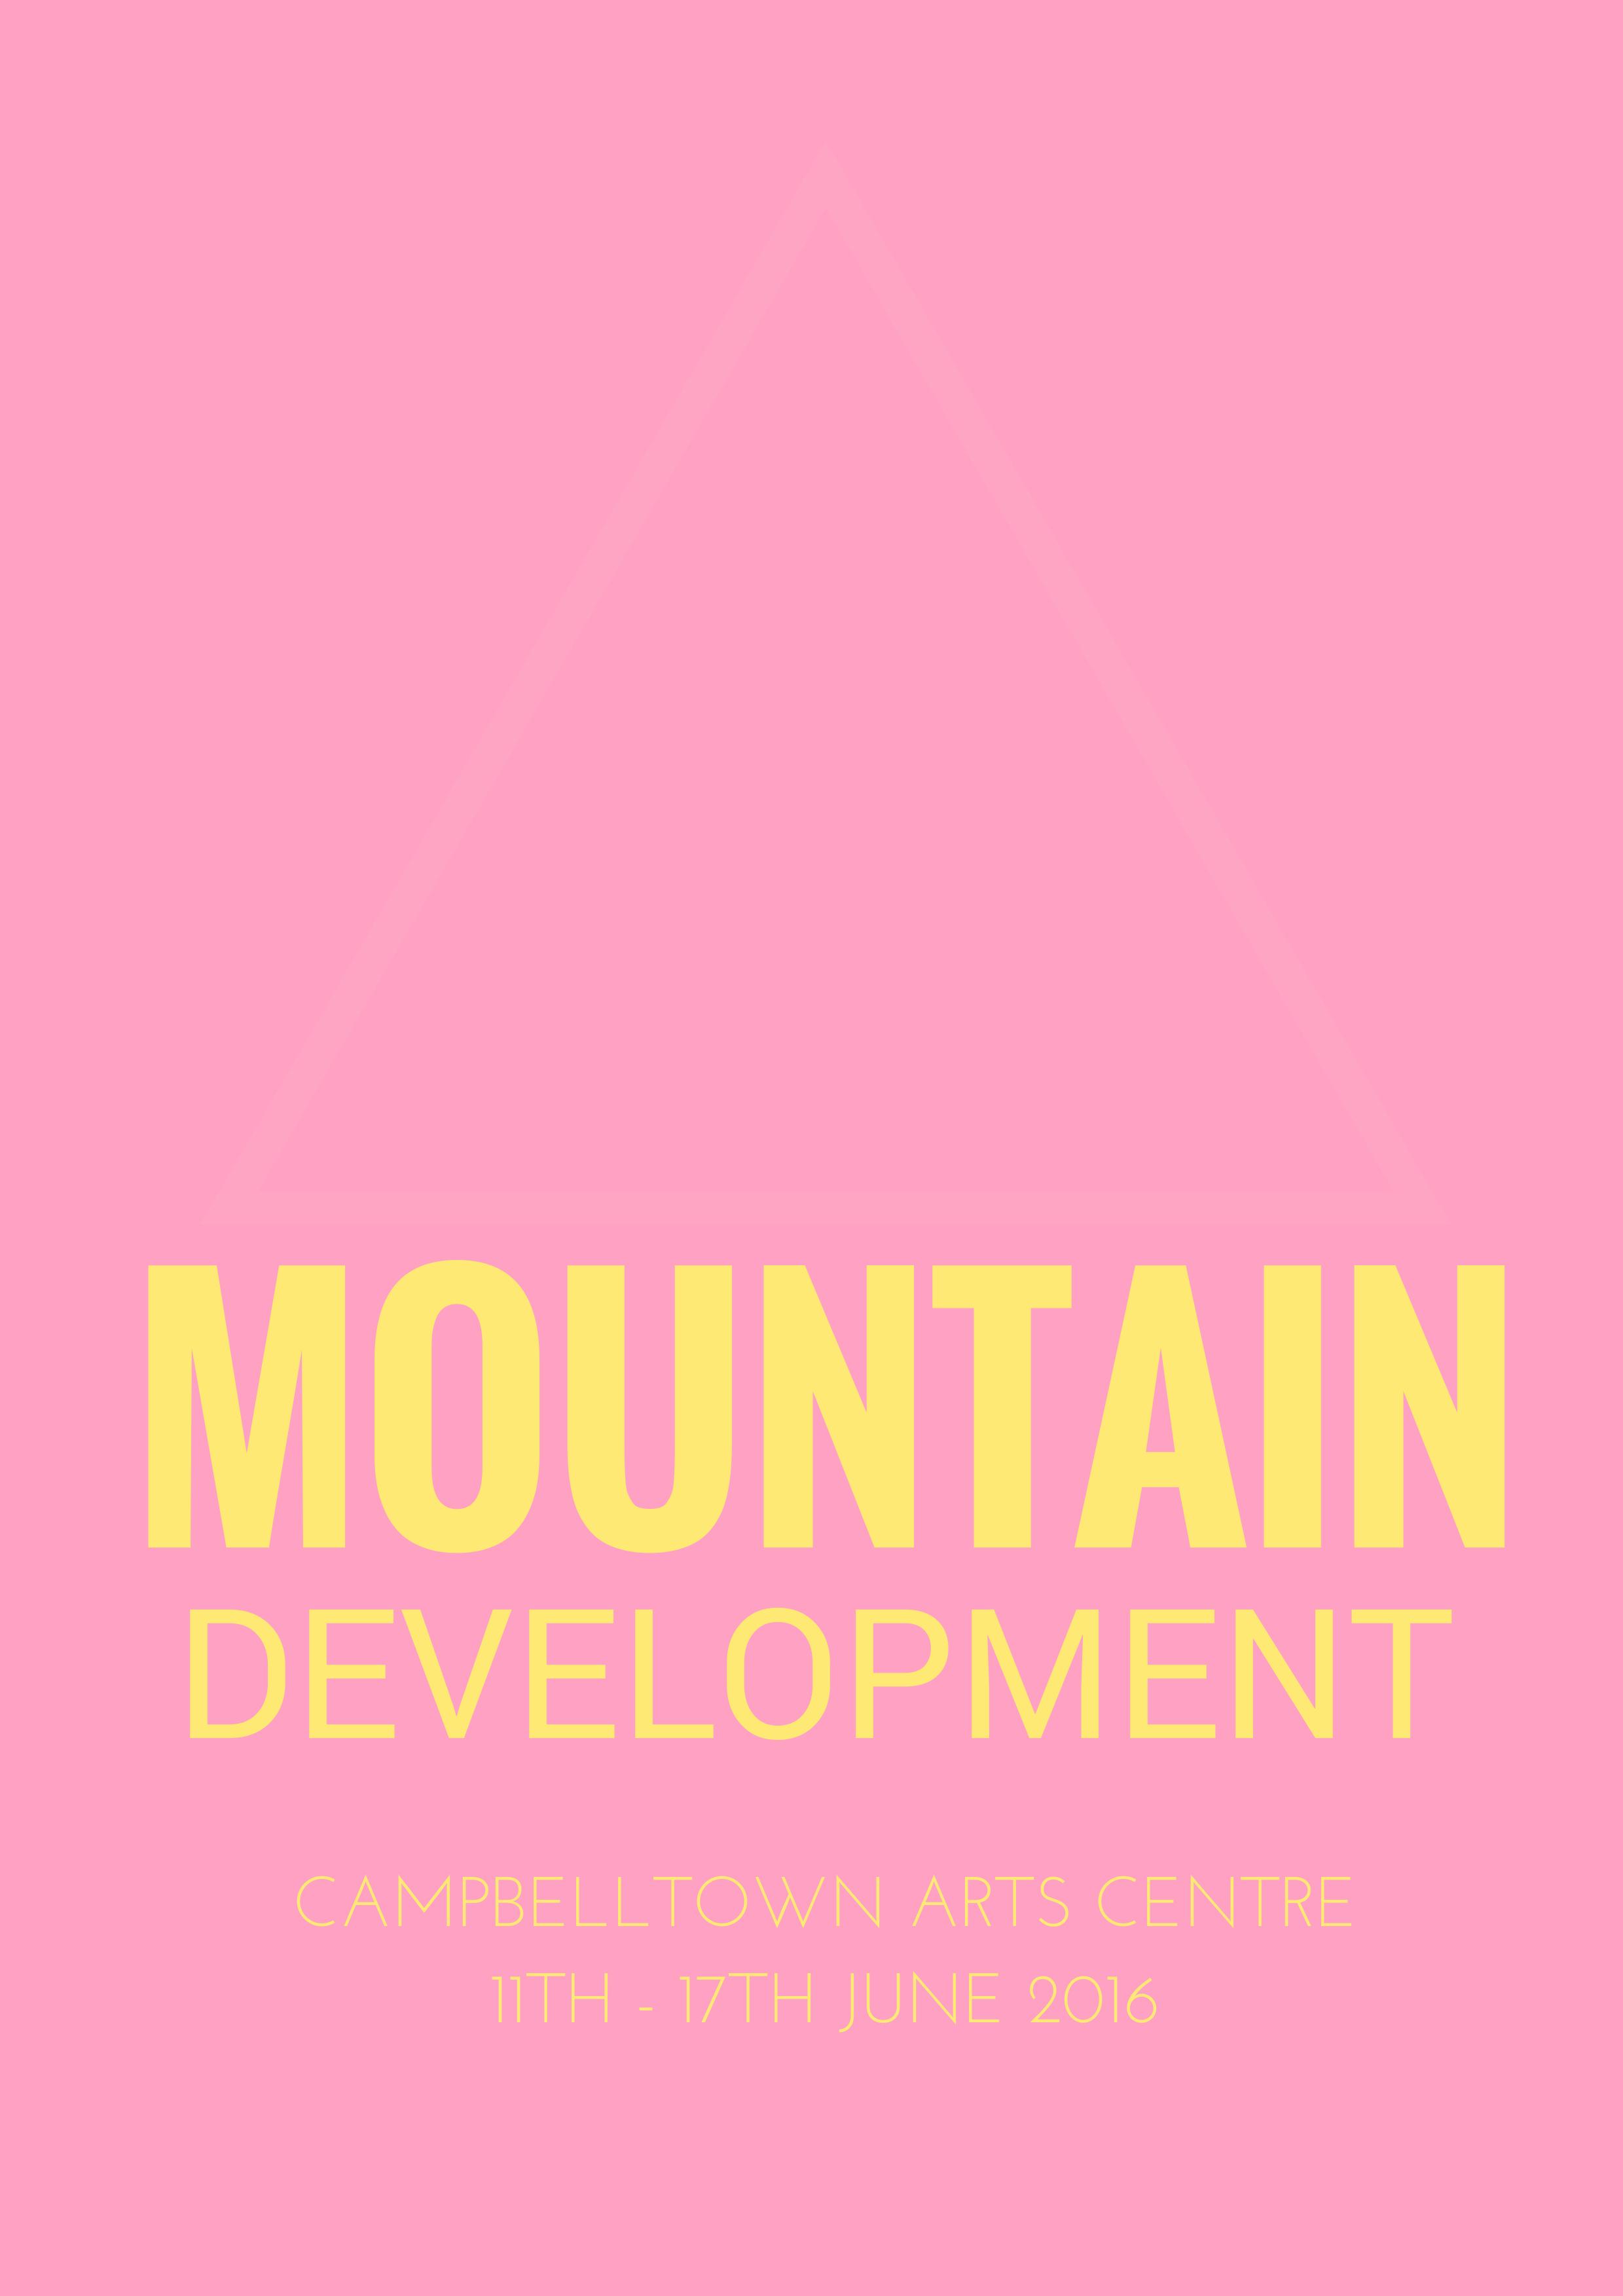 mountainzine-1.jpg